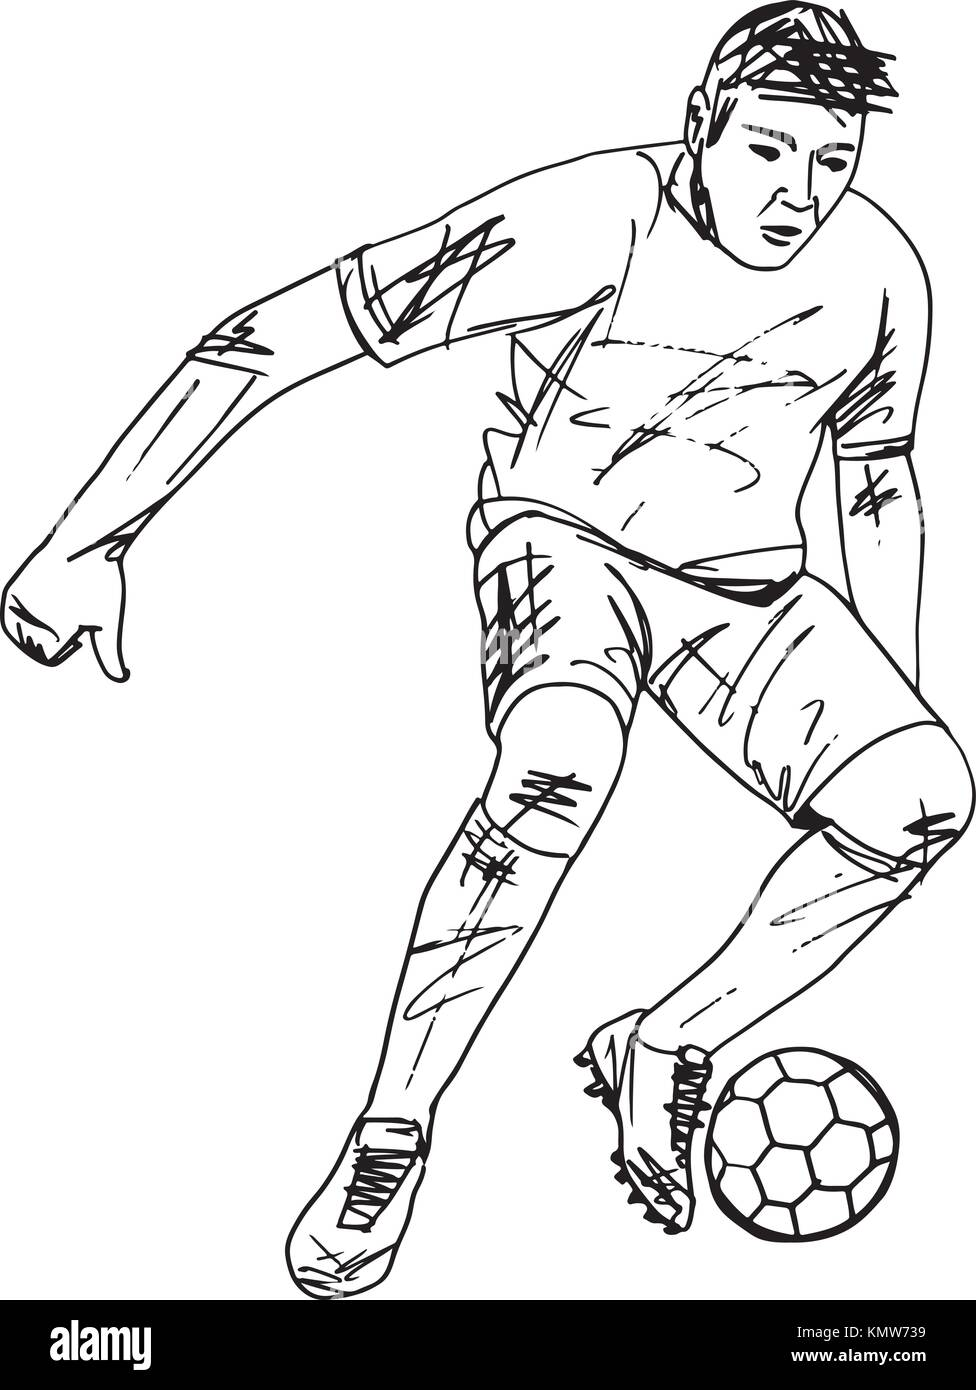 Sketch of Footbal player illustration - Stock Vector